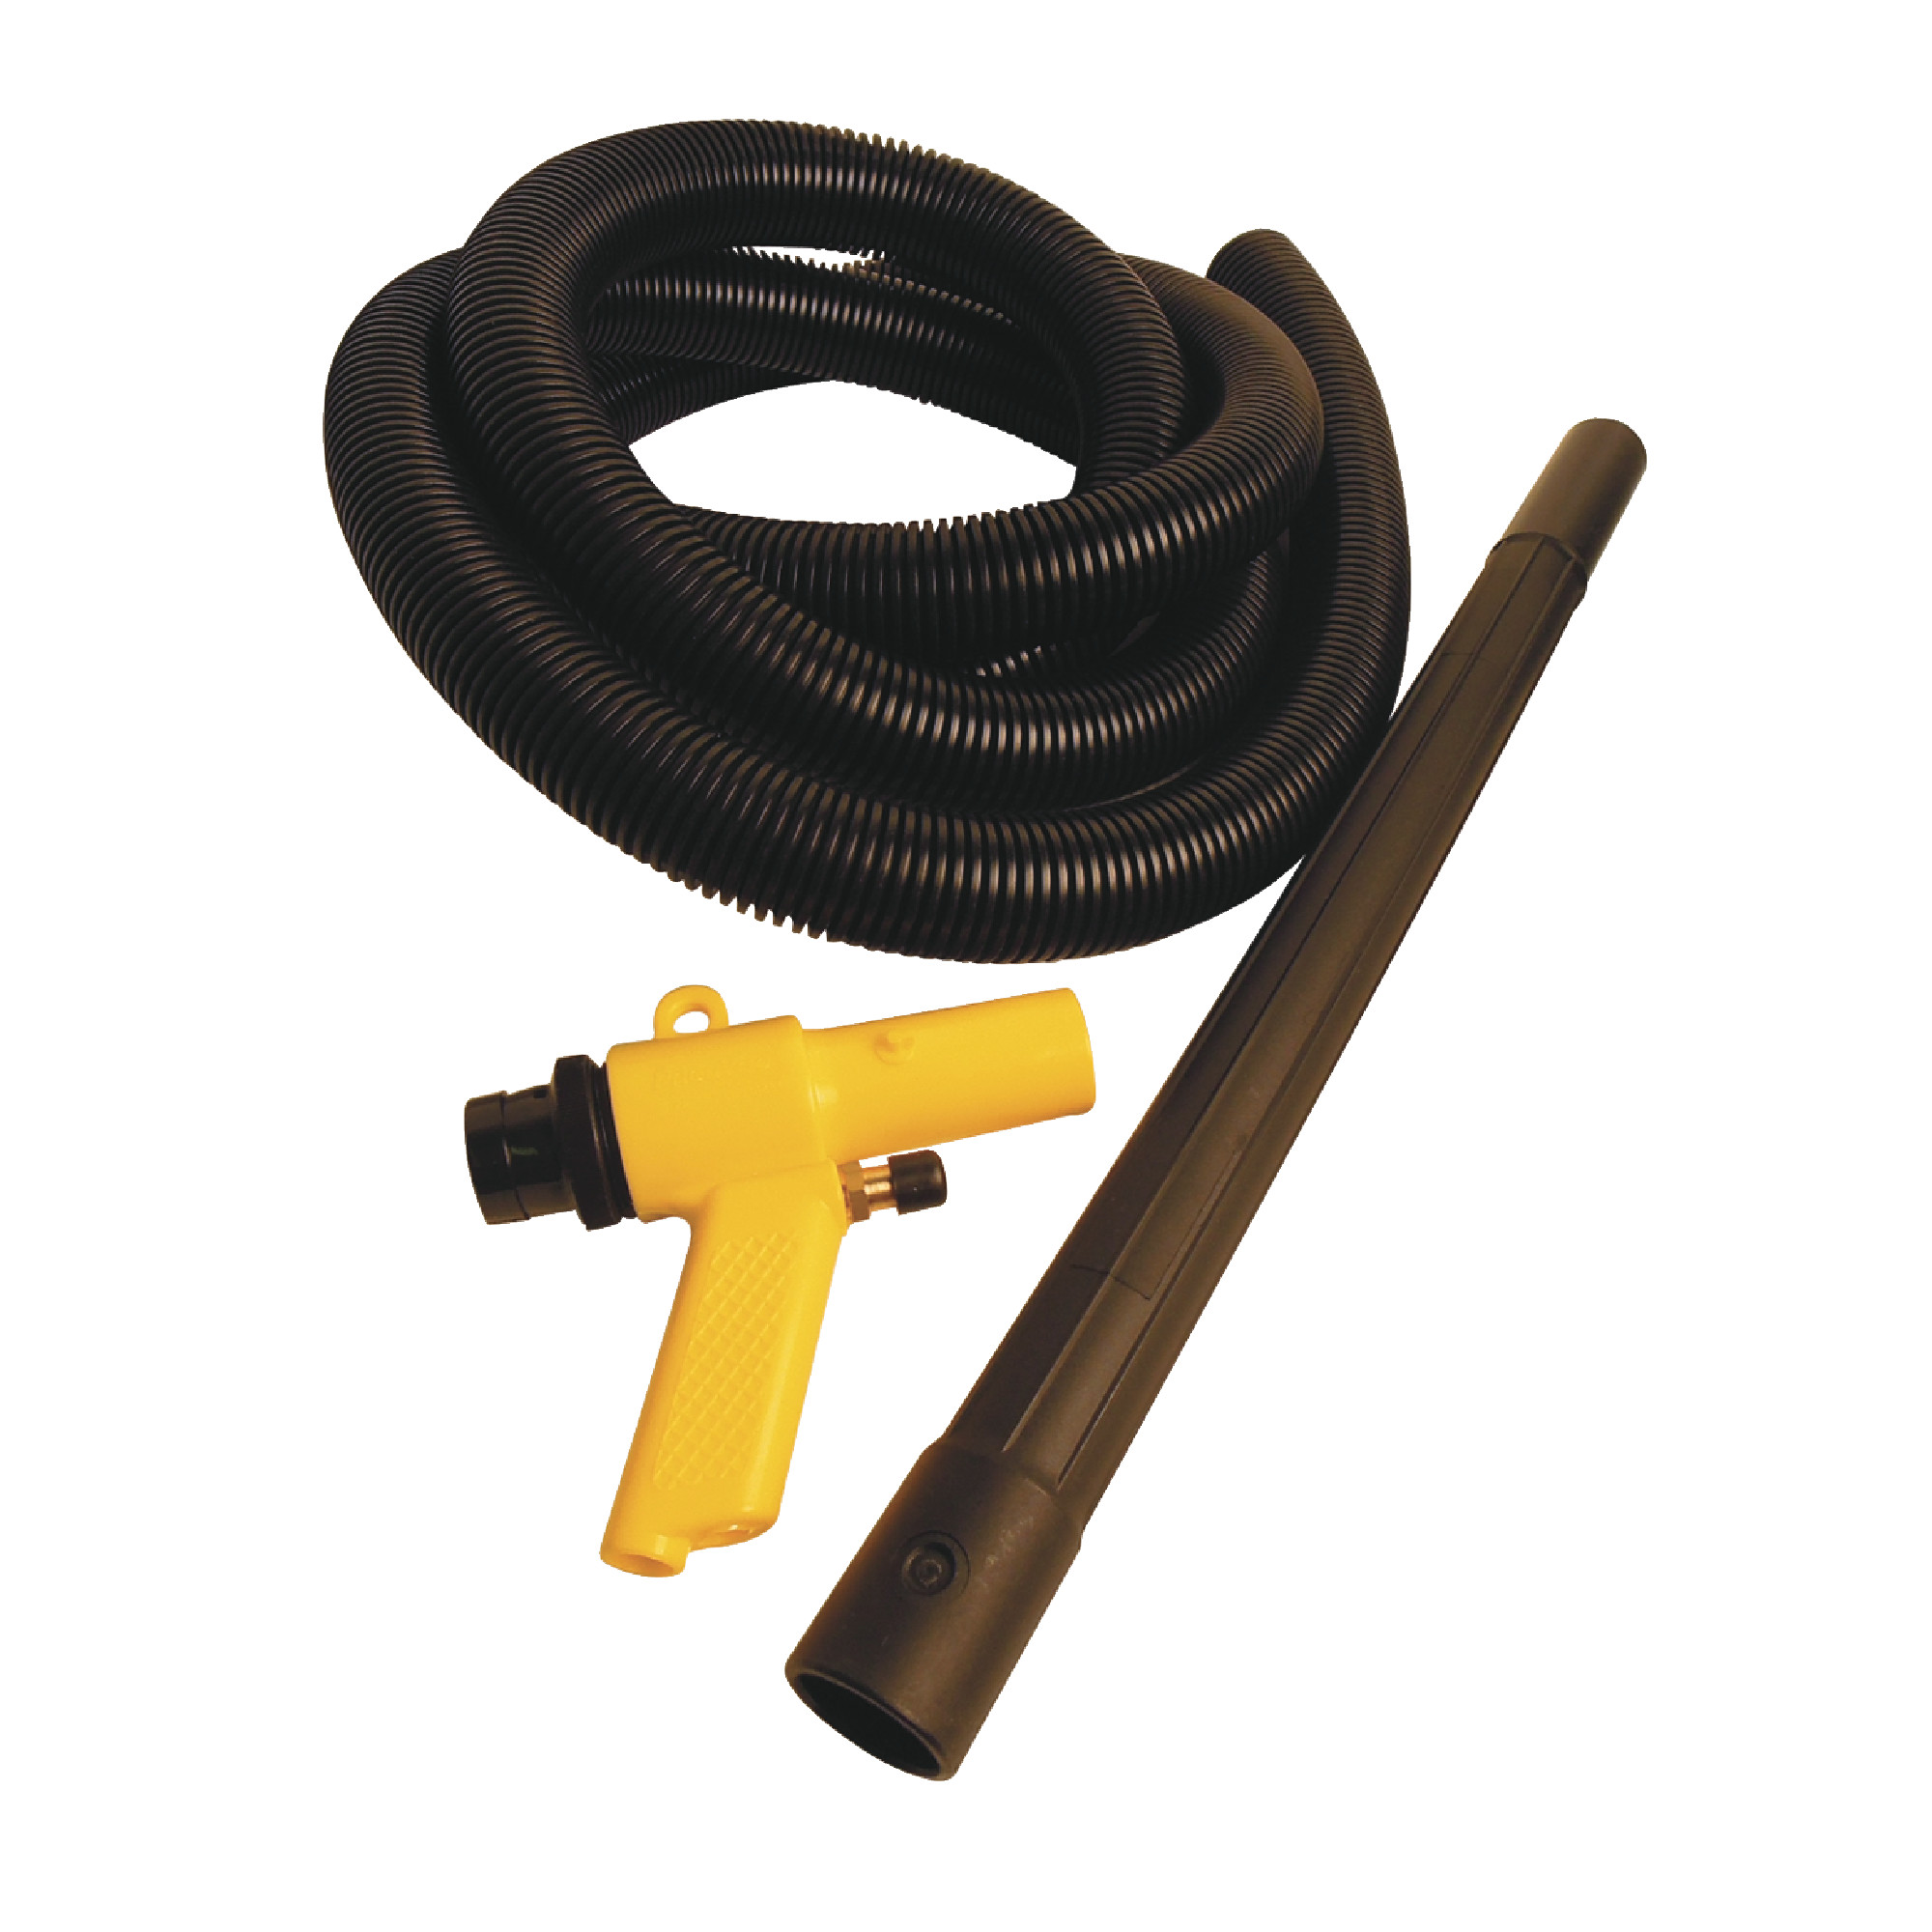 Accessory for PneuVac Pistol Air Gun